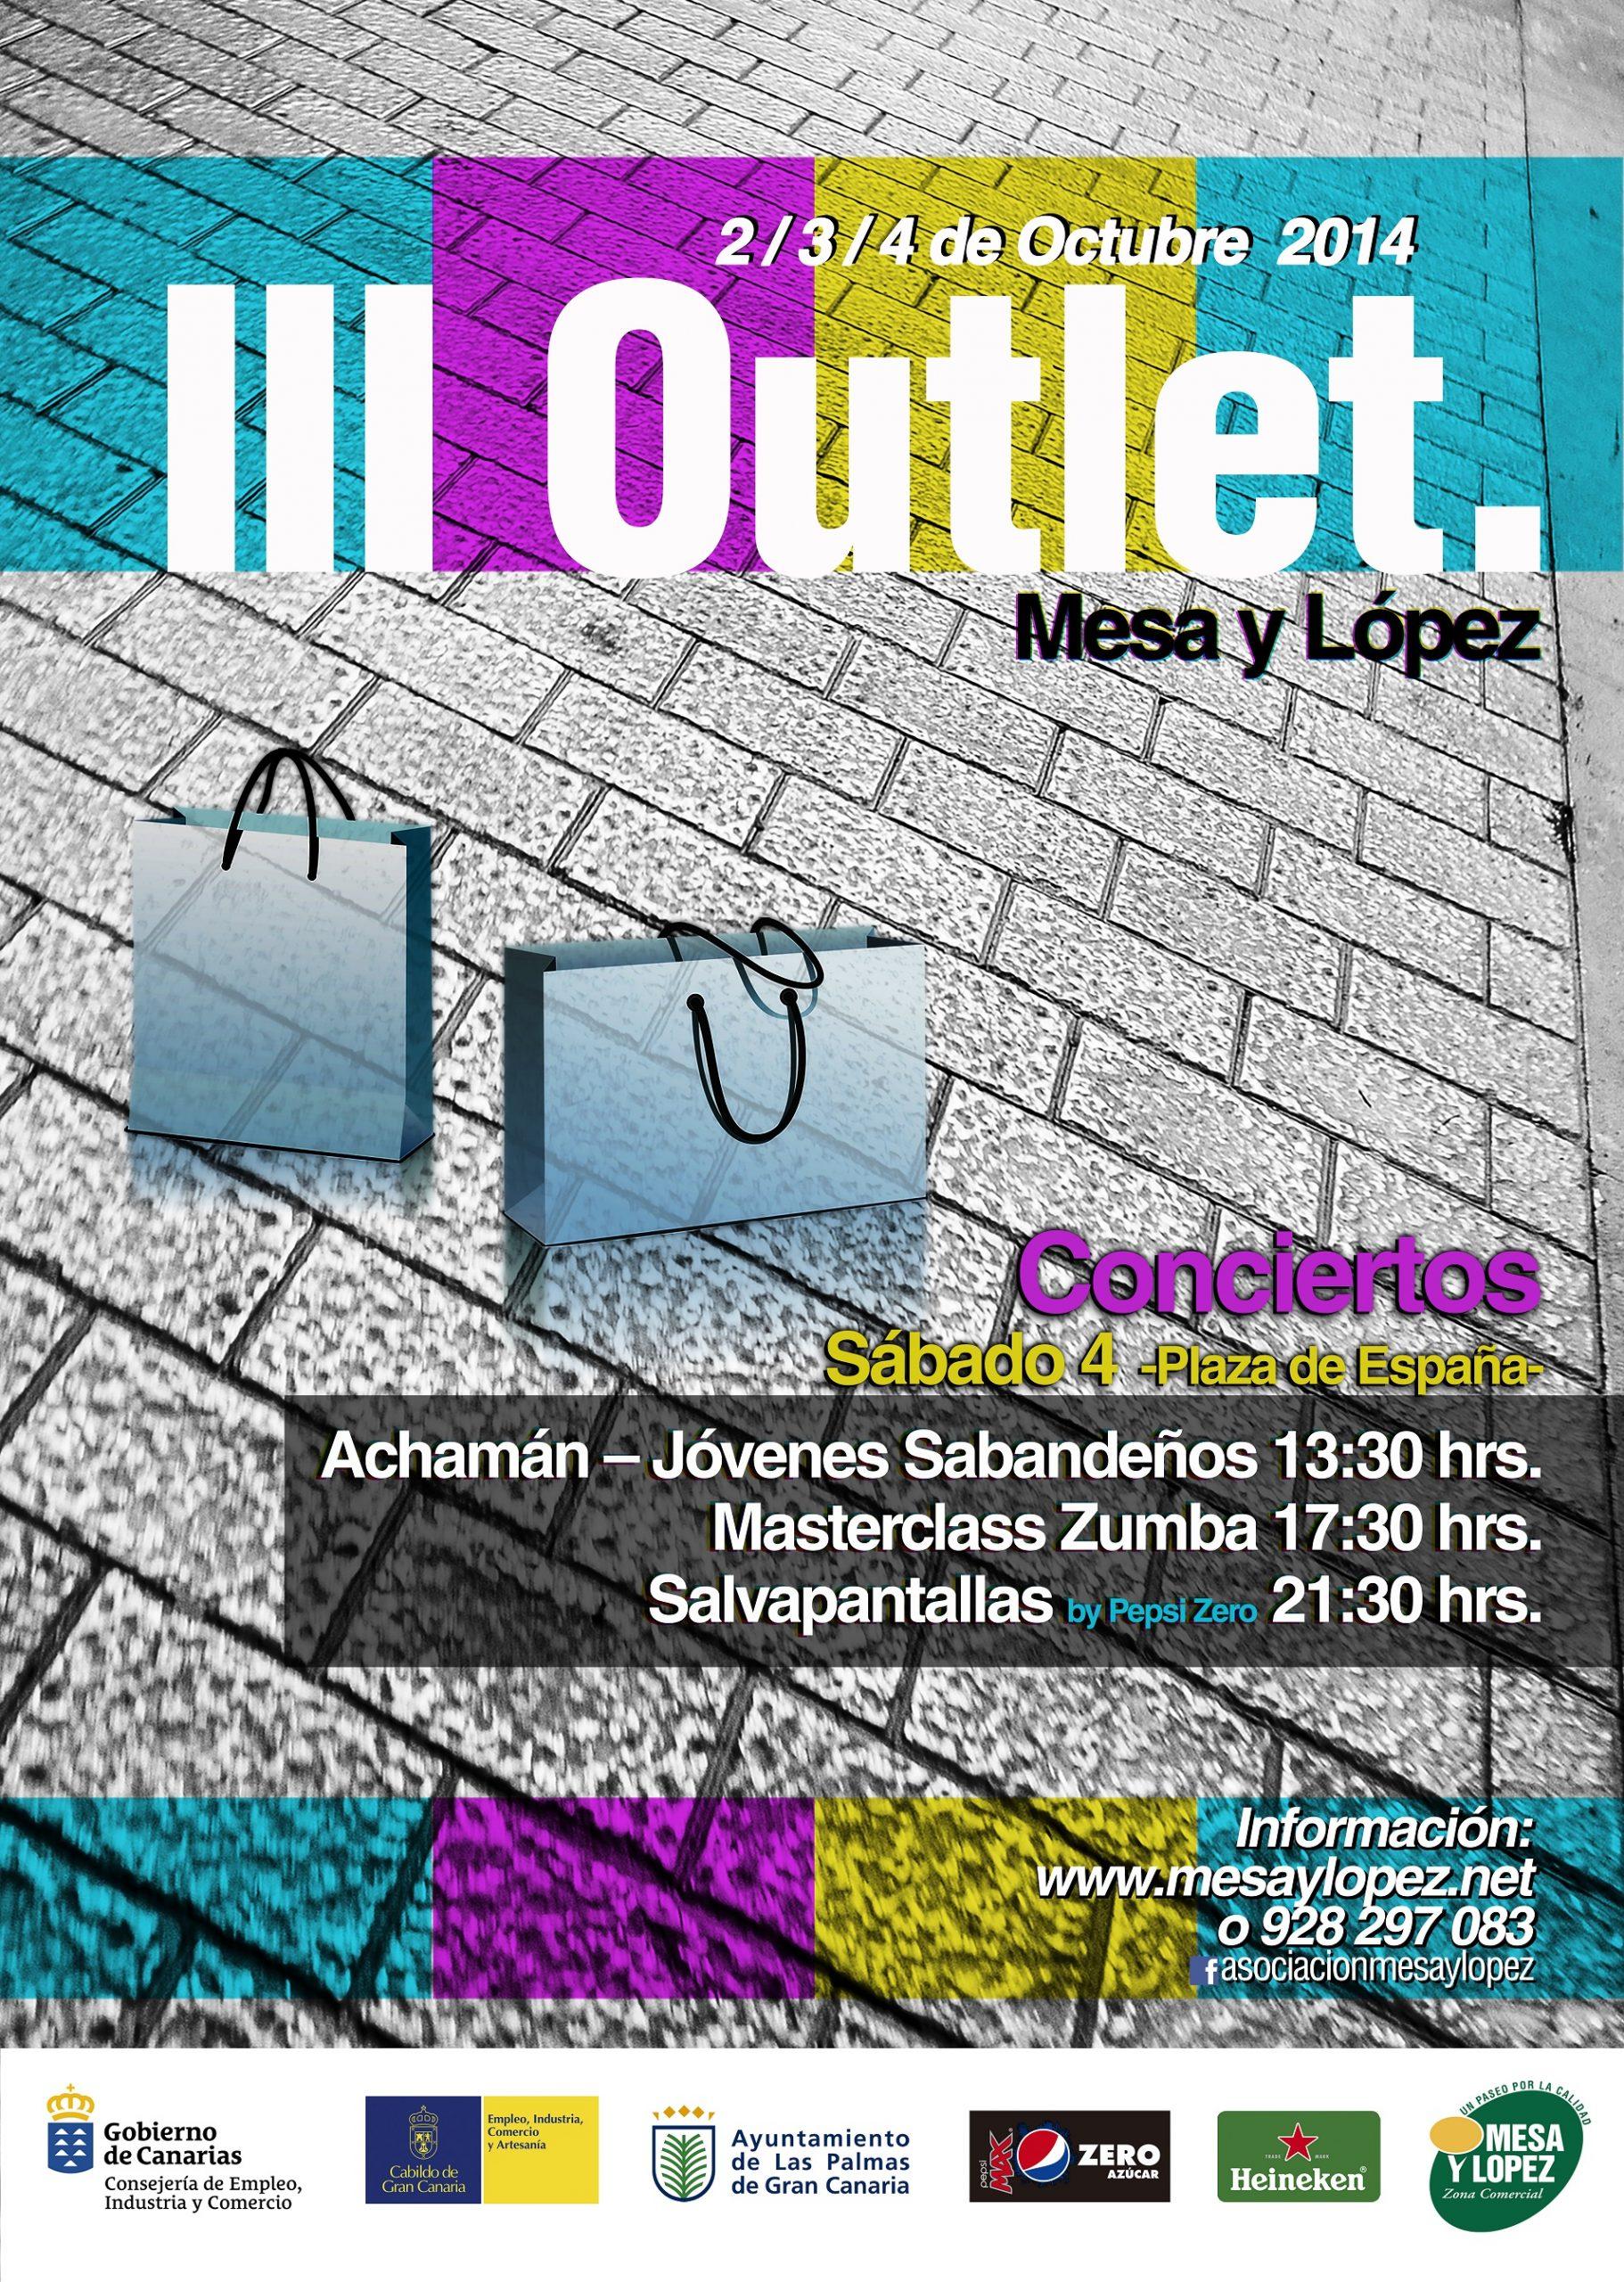 III Outlet Zona Mesa y López